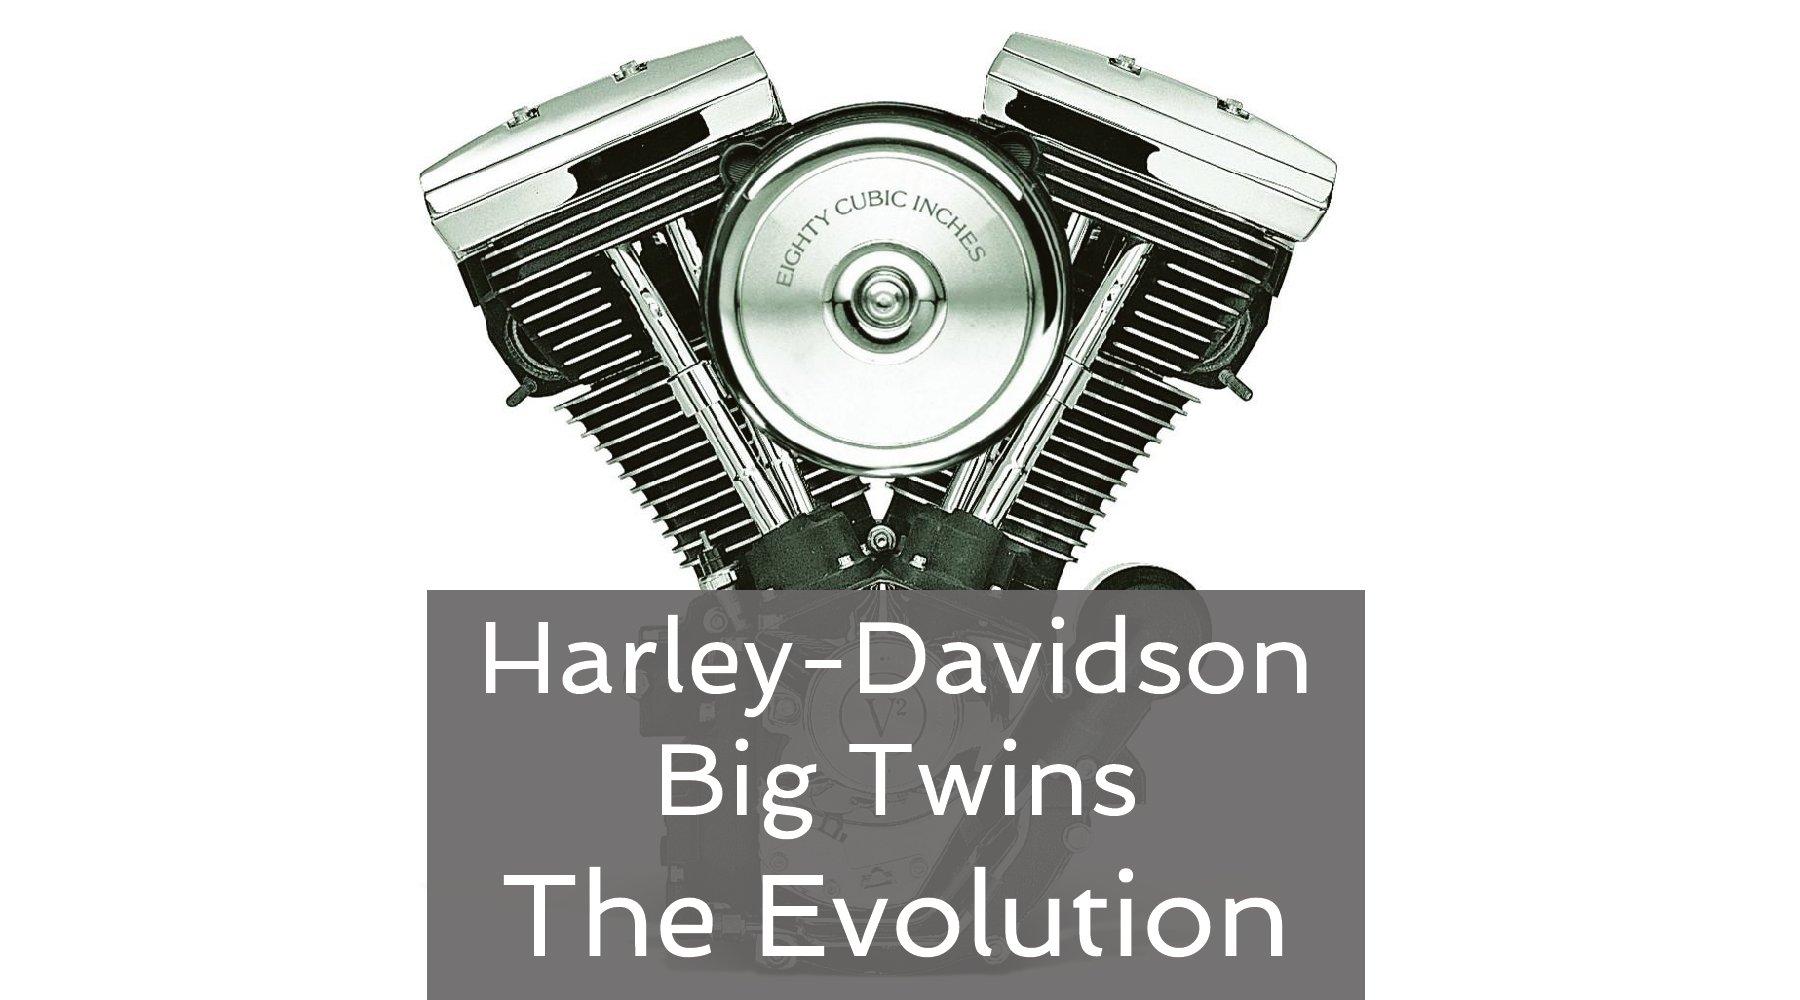 harley davidson big twins the evolution rh silodrome com Harley Evolution Engine Dimensions Harley-Davidson Engine Exploded View